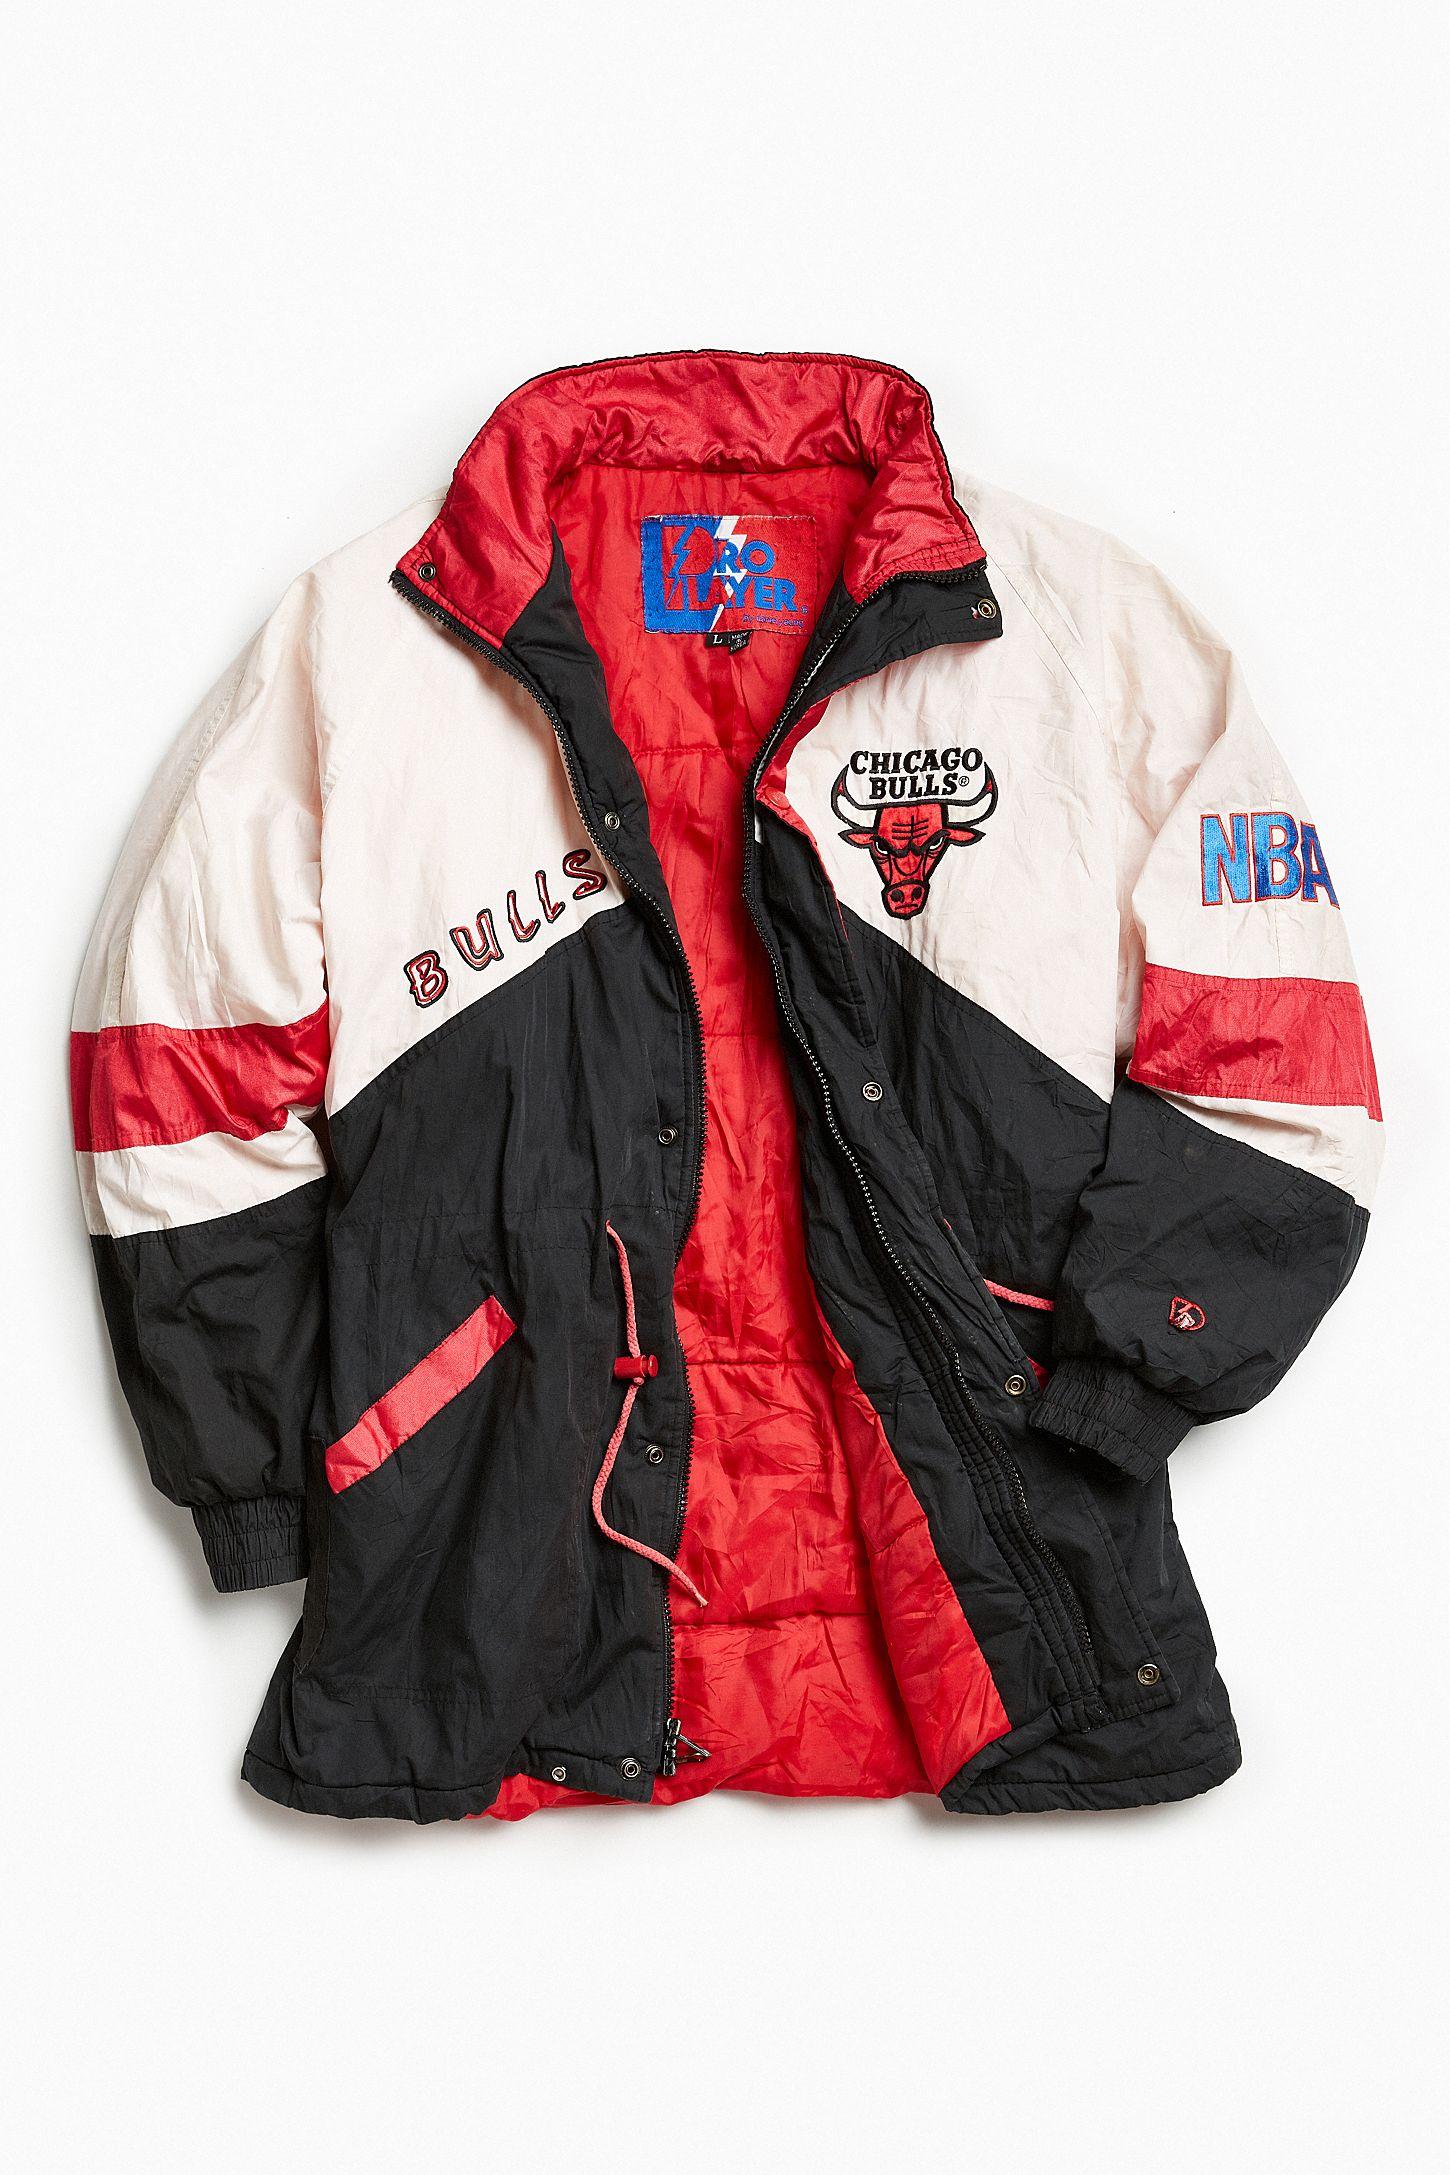 Vintage Pro Player Chicago Bulls Full-Zip Jacket  70afab04f989